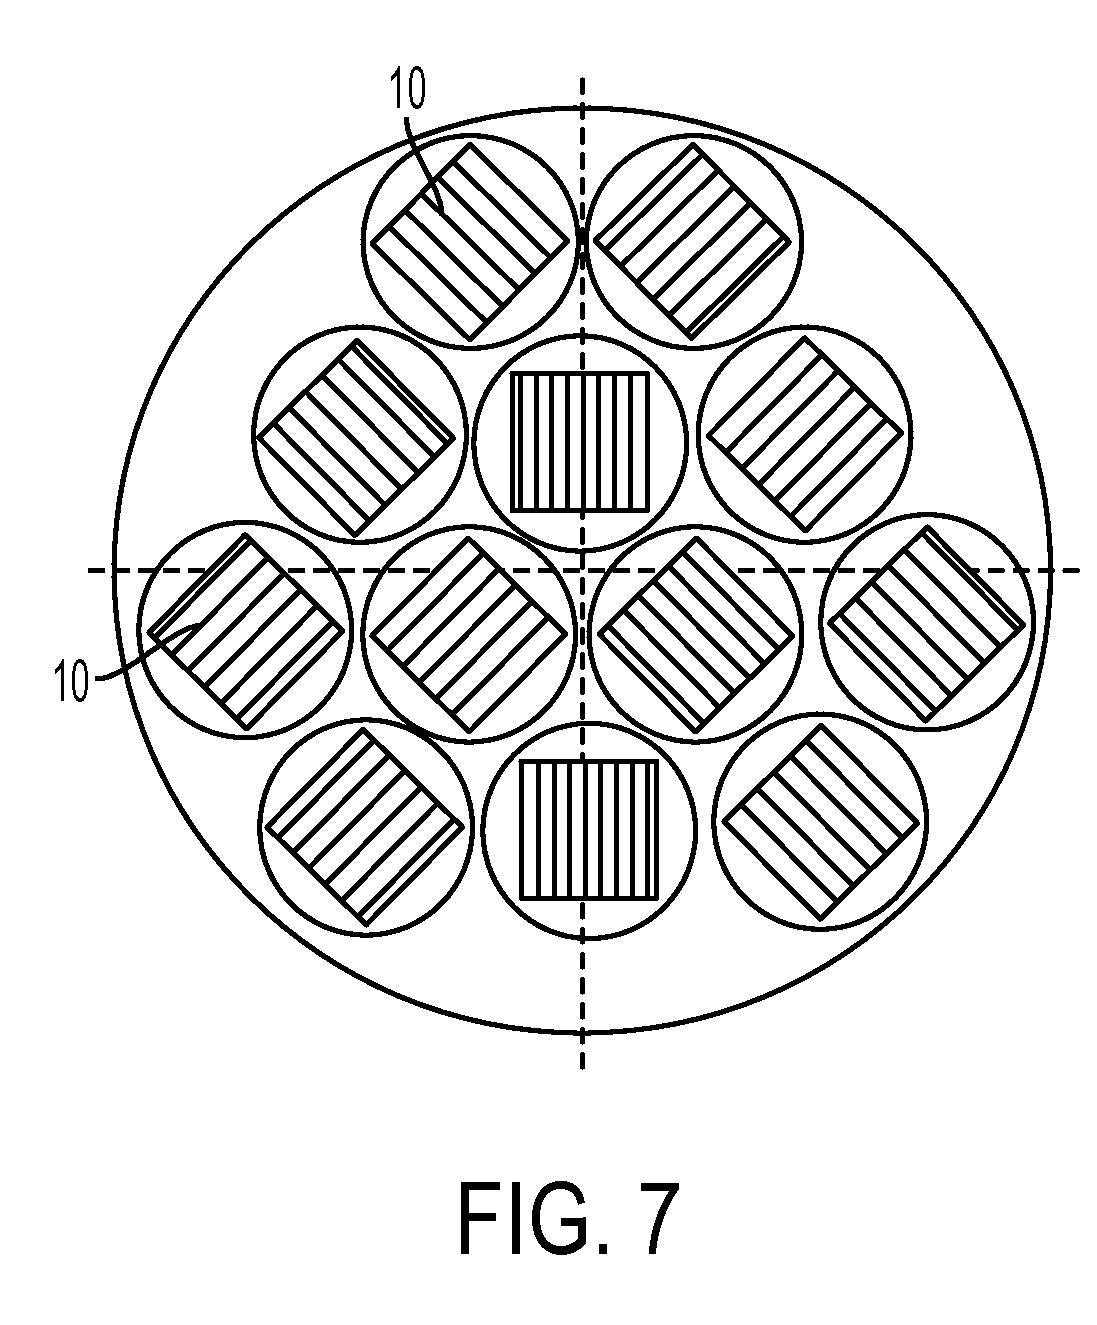 Heat Tape Wiring Diagram : 24 Wiring Diagram Images